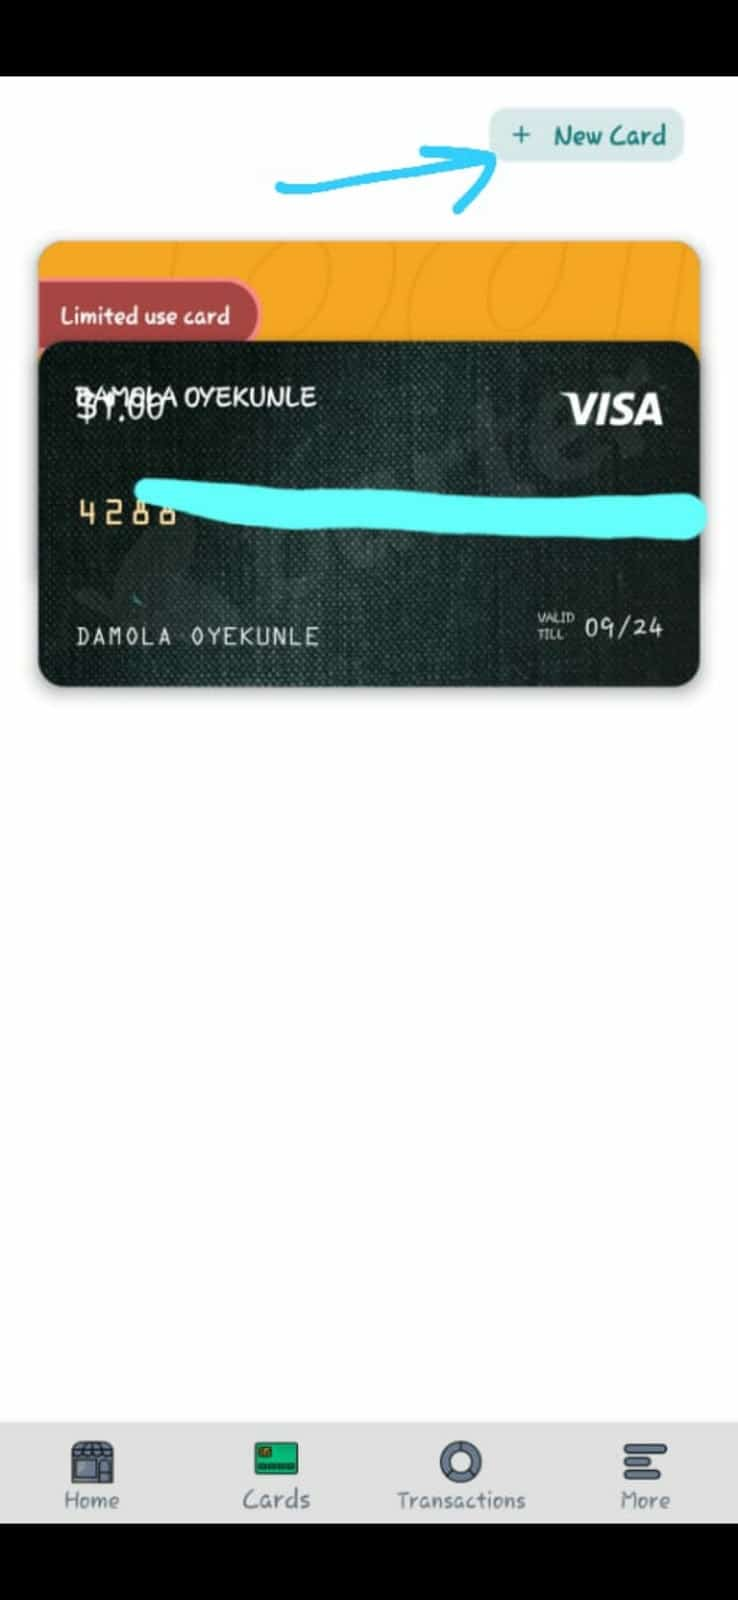 new card creation for a barter virtual dollar card